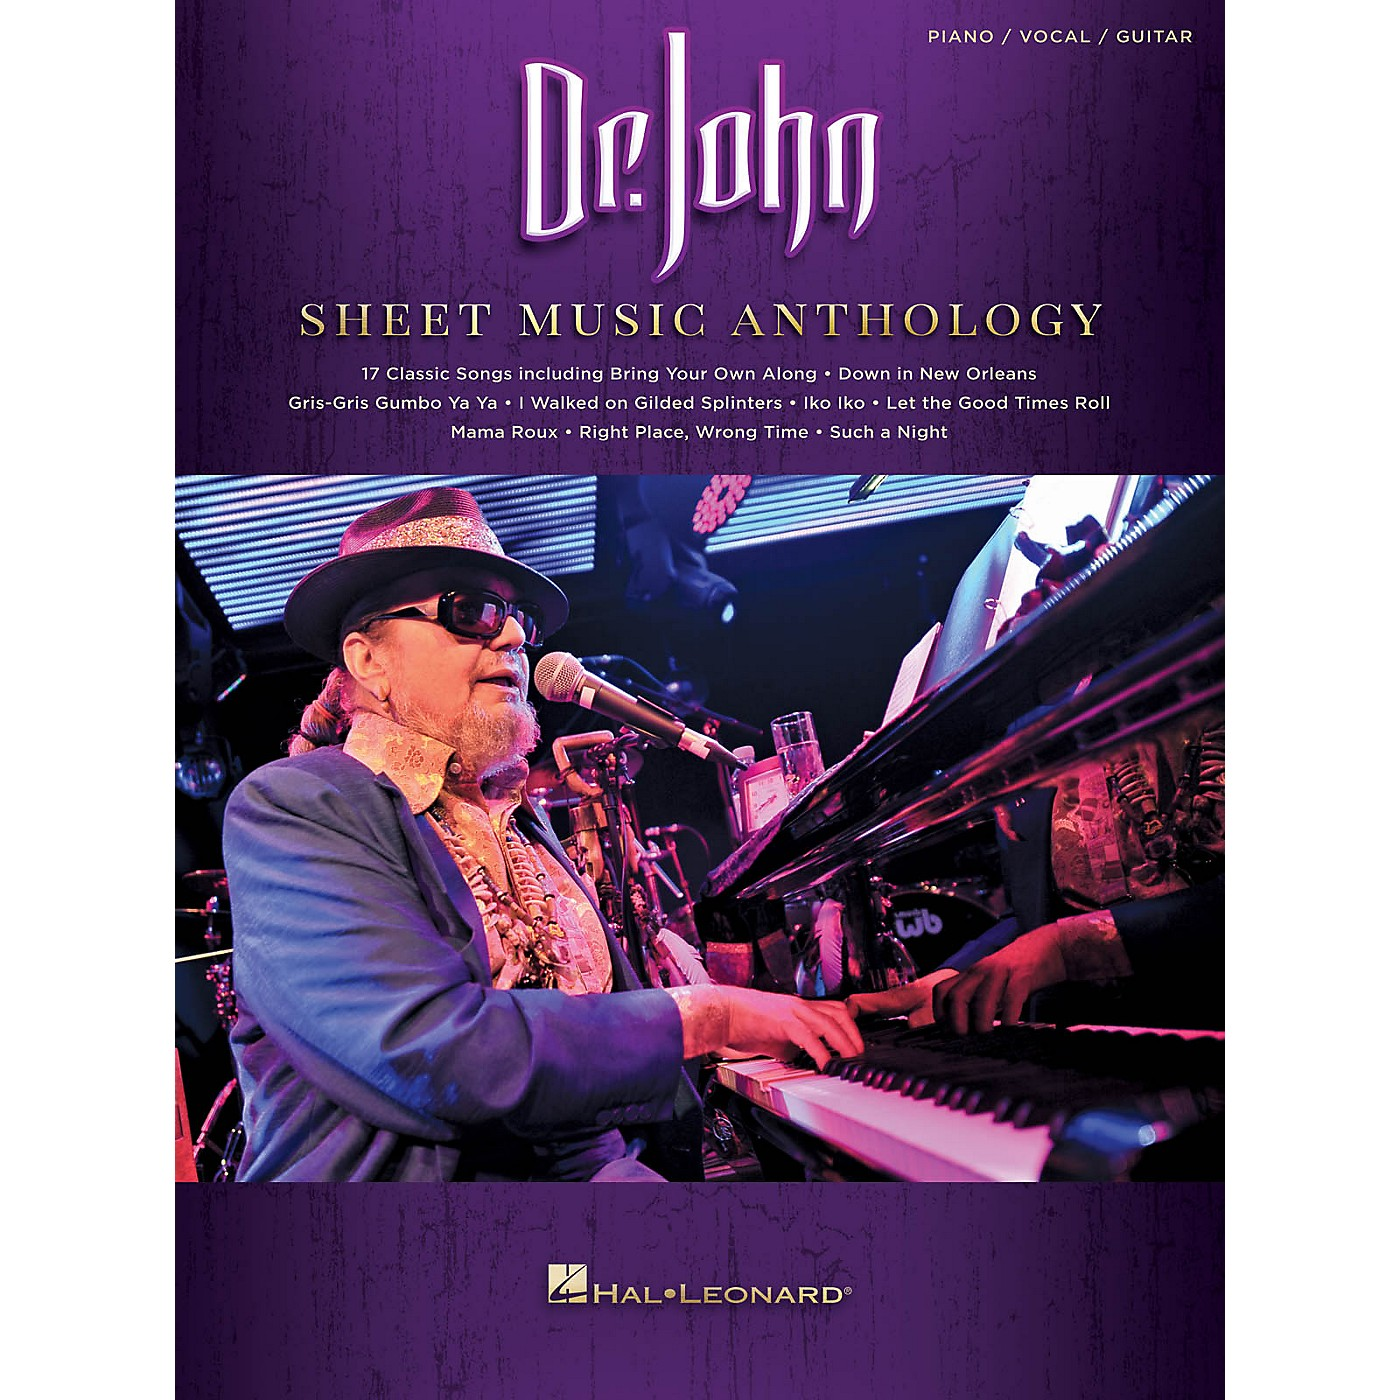 Hal Leonard Dr. John Sheet Music Anthology Piano/Vocal/Guitar Songbook thumbnail